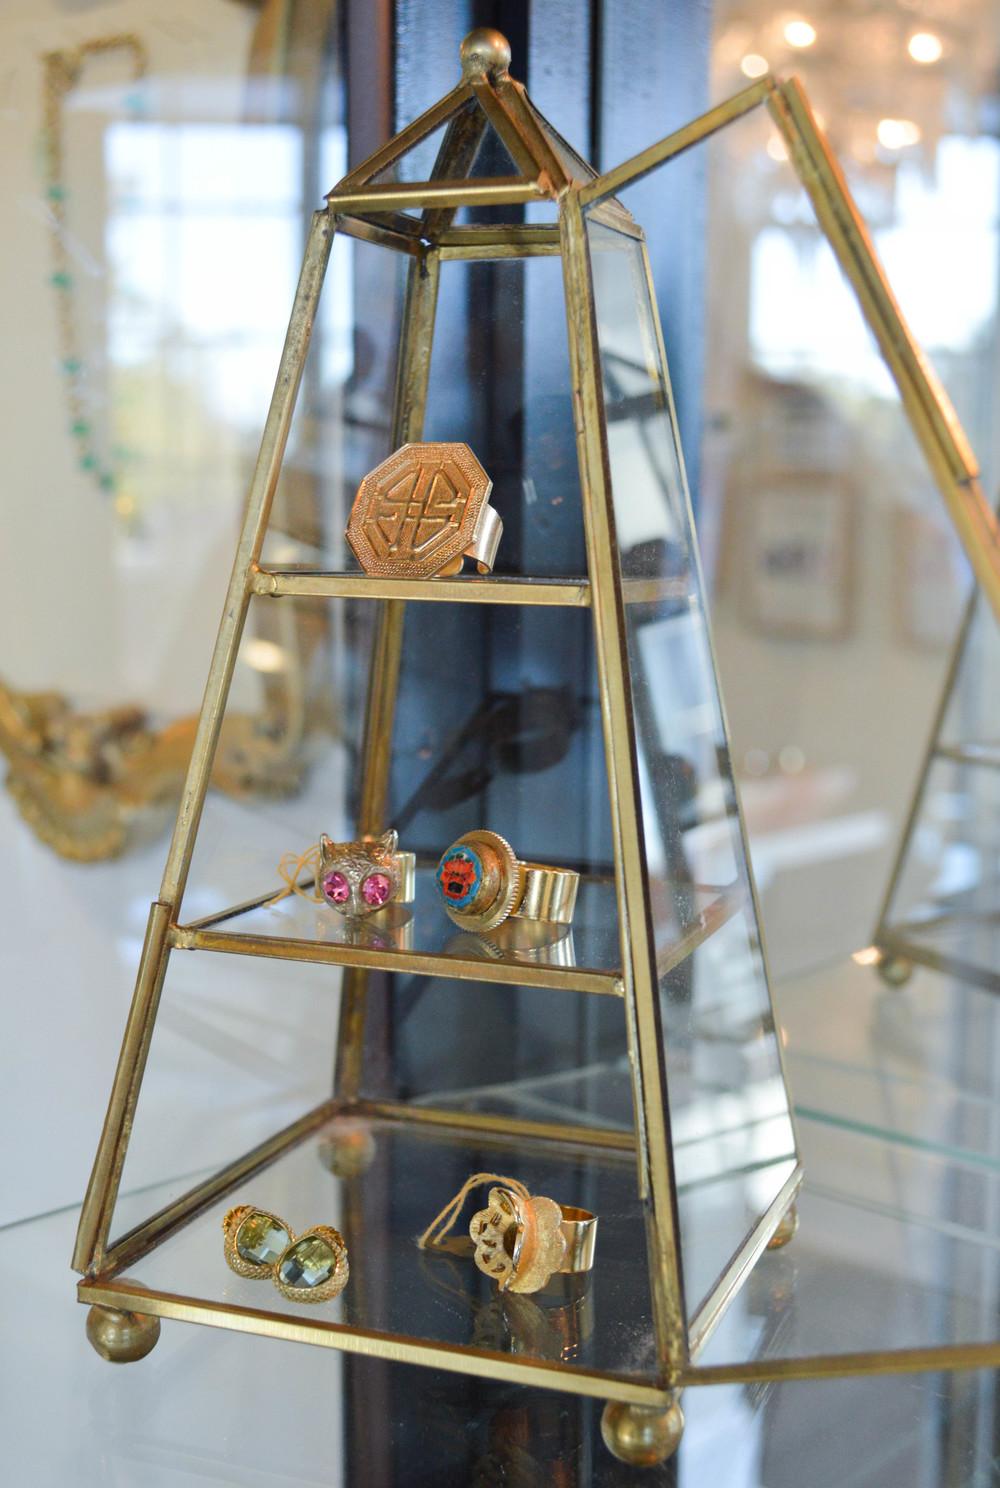 LaurenSchwaiger-Life-Style-Blog-Laura-James-Jewelry-Charlotte-NC.jpg